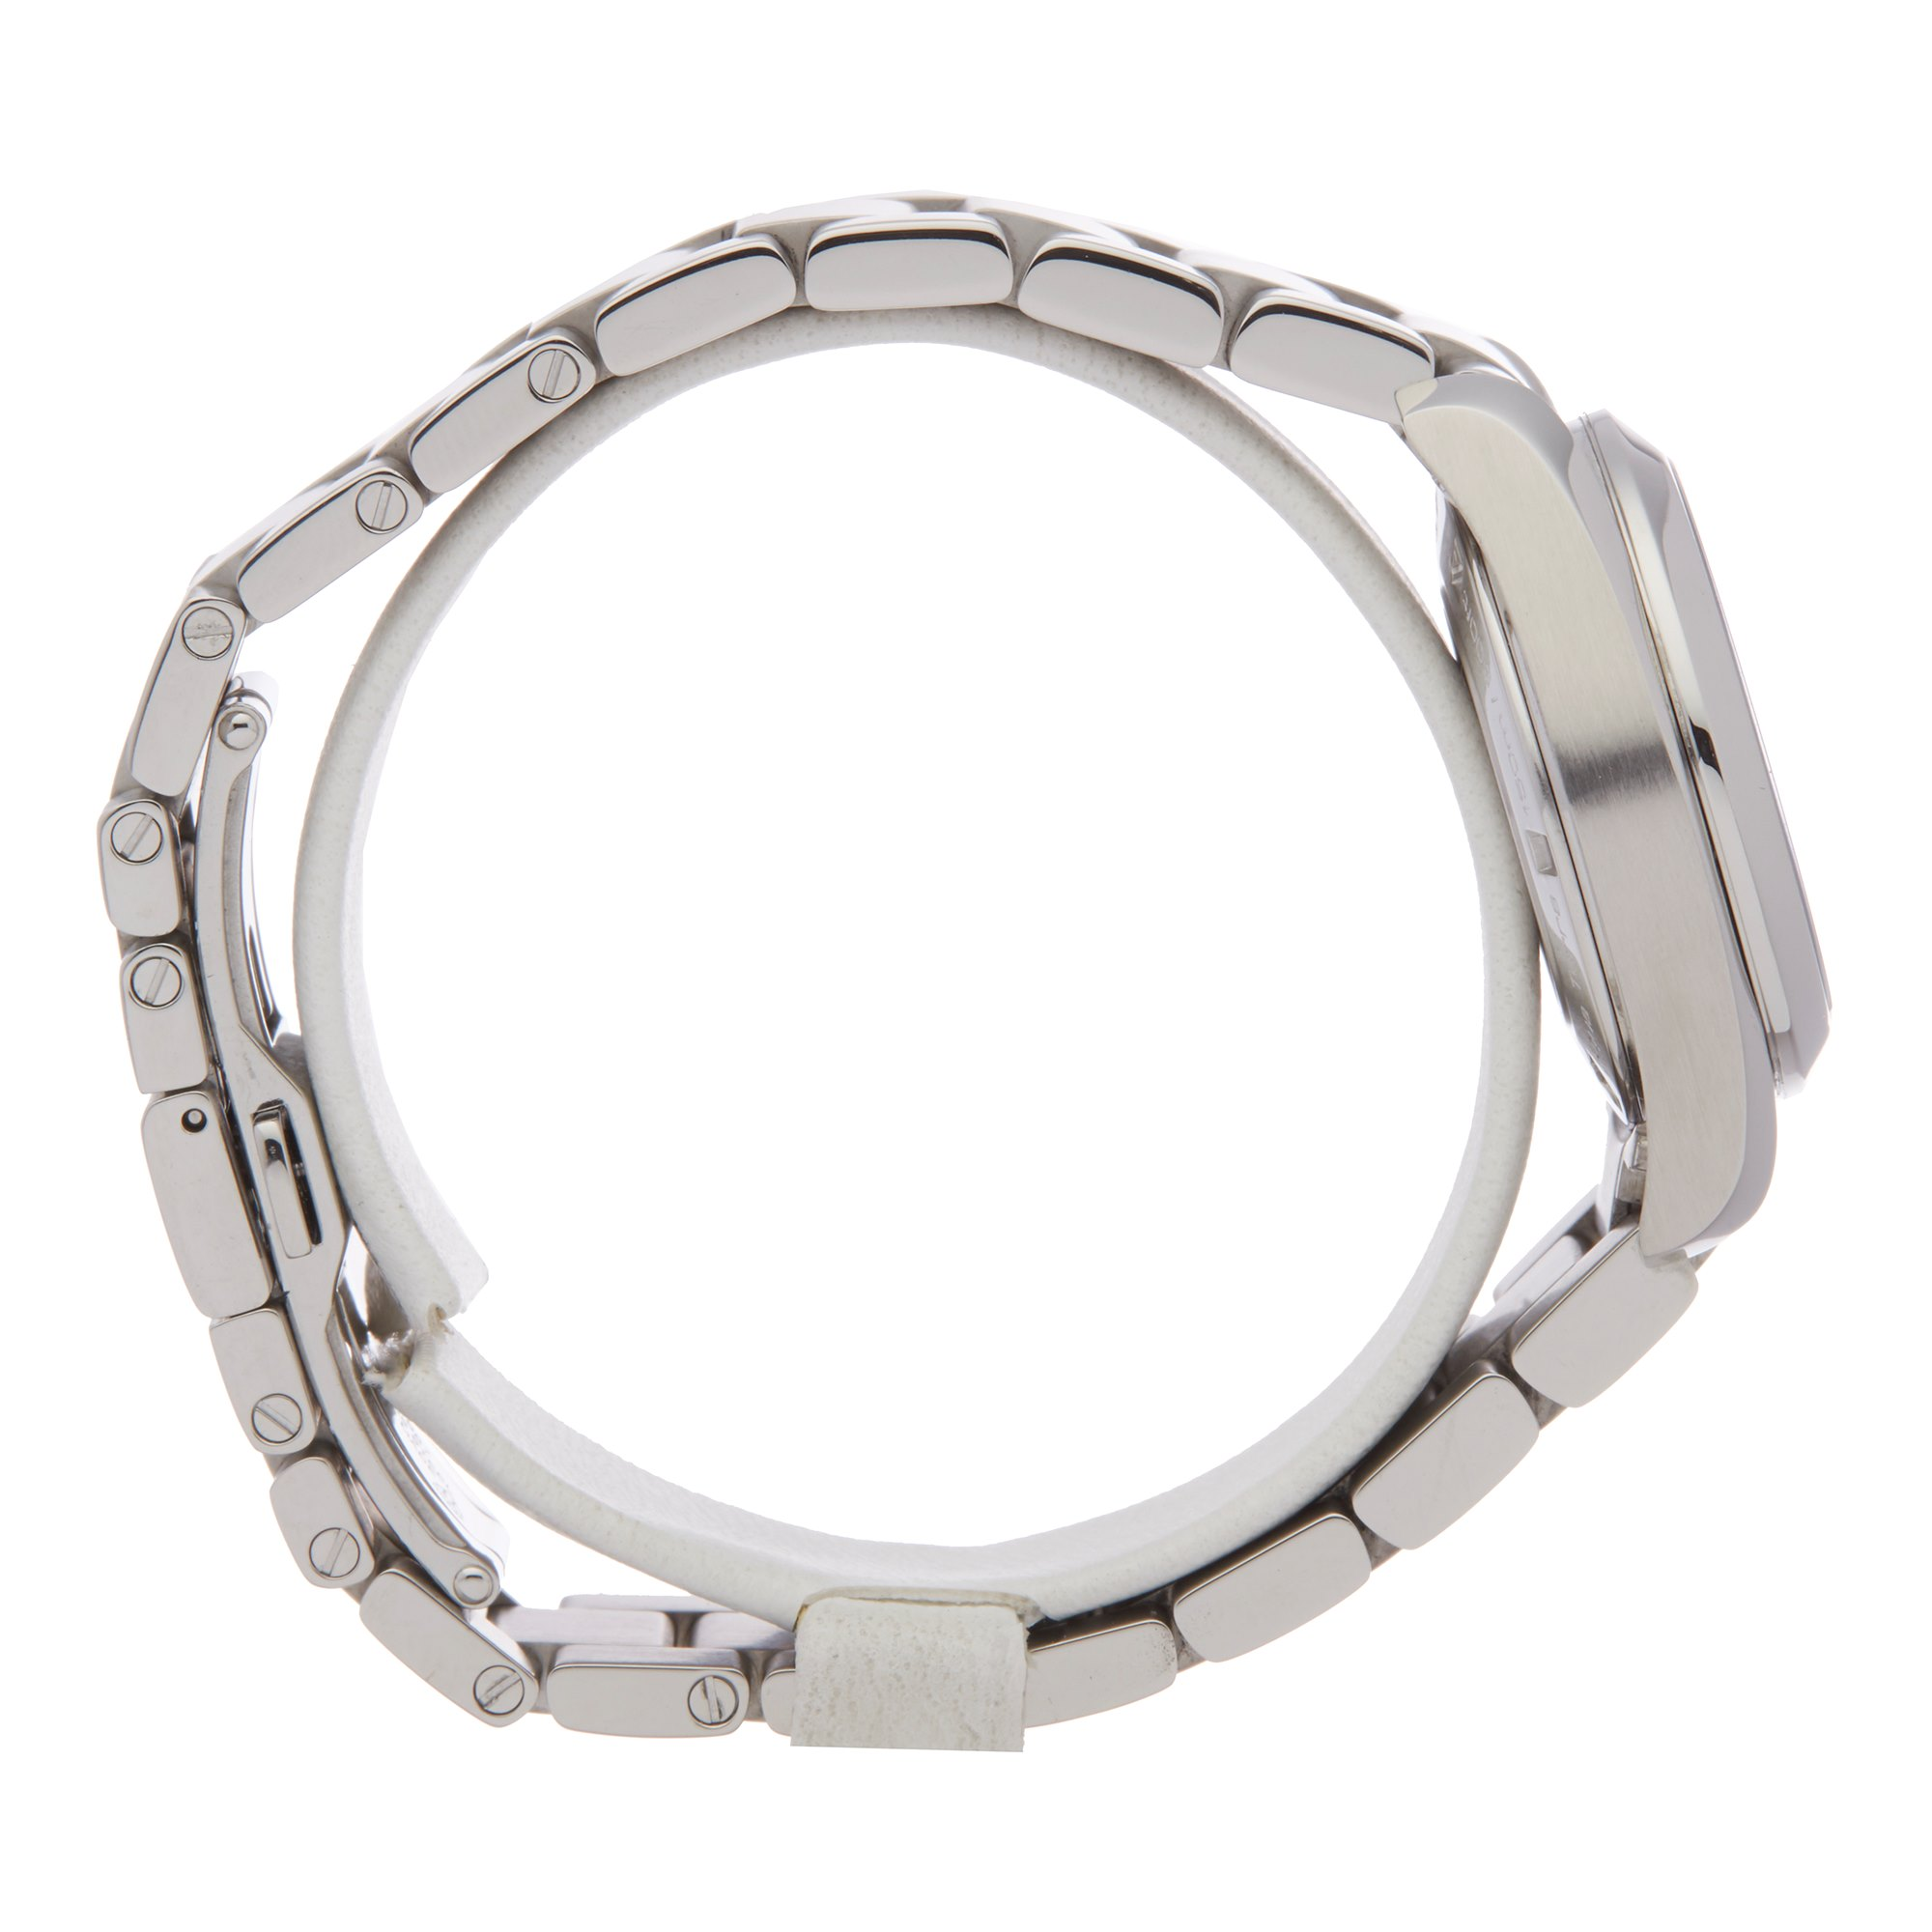 Omega Seamaster Diamond Stainless Steel 231.10.30.61.56.001